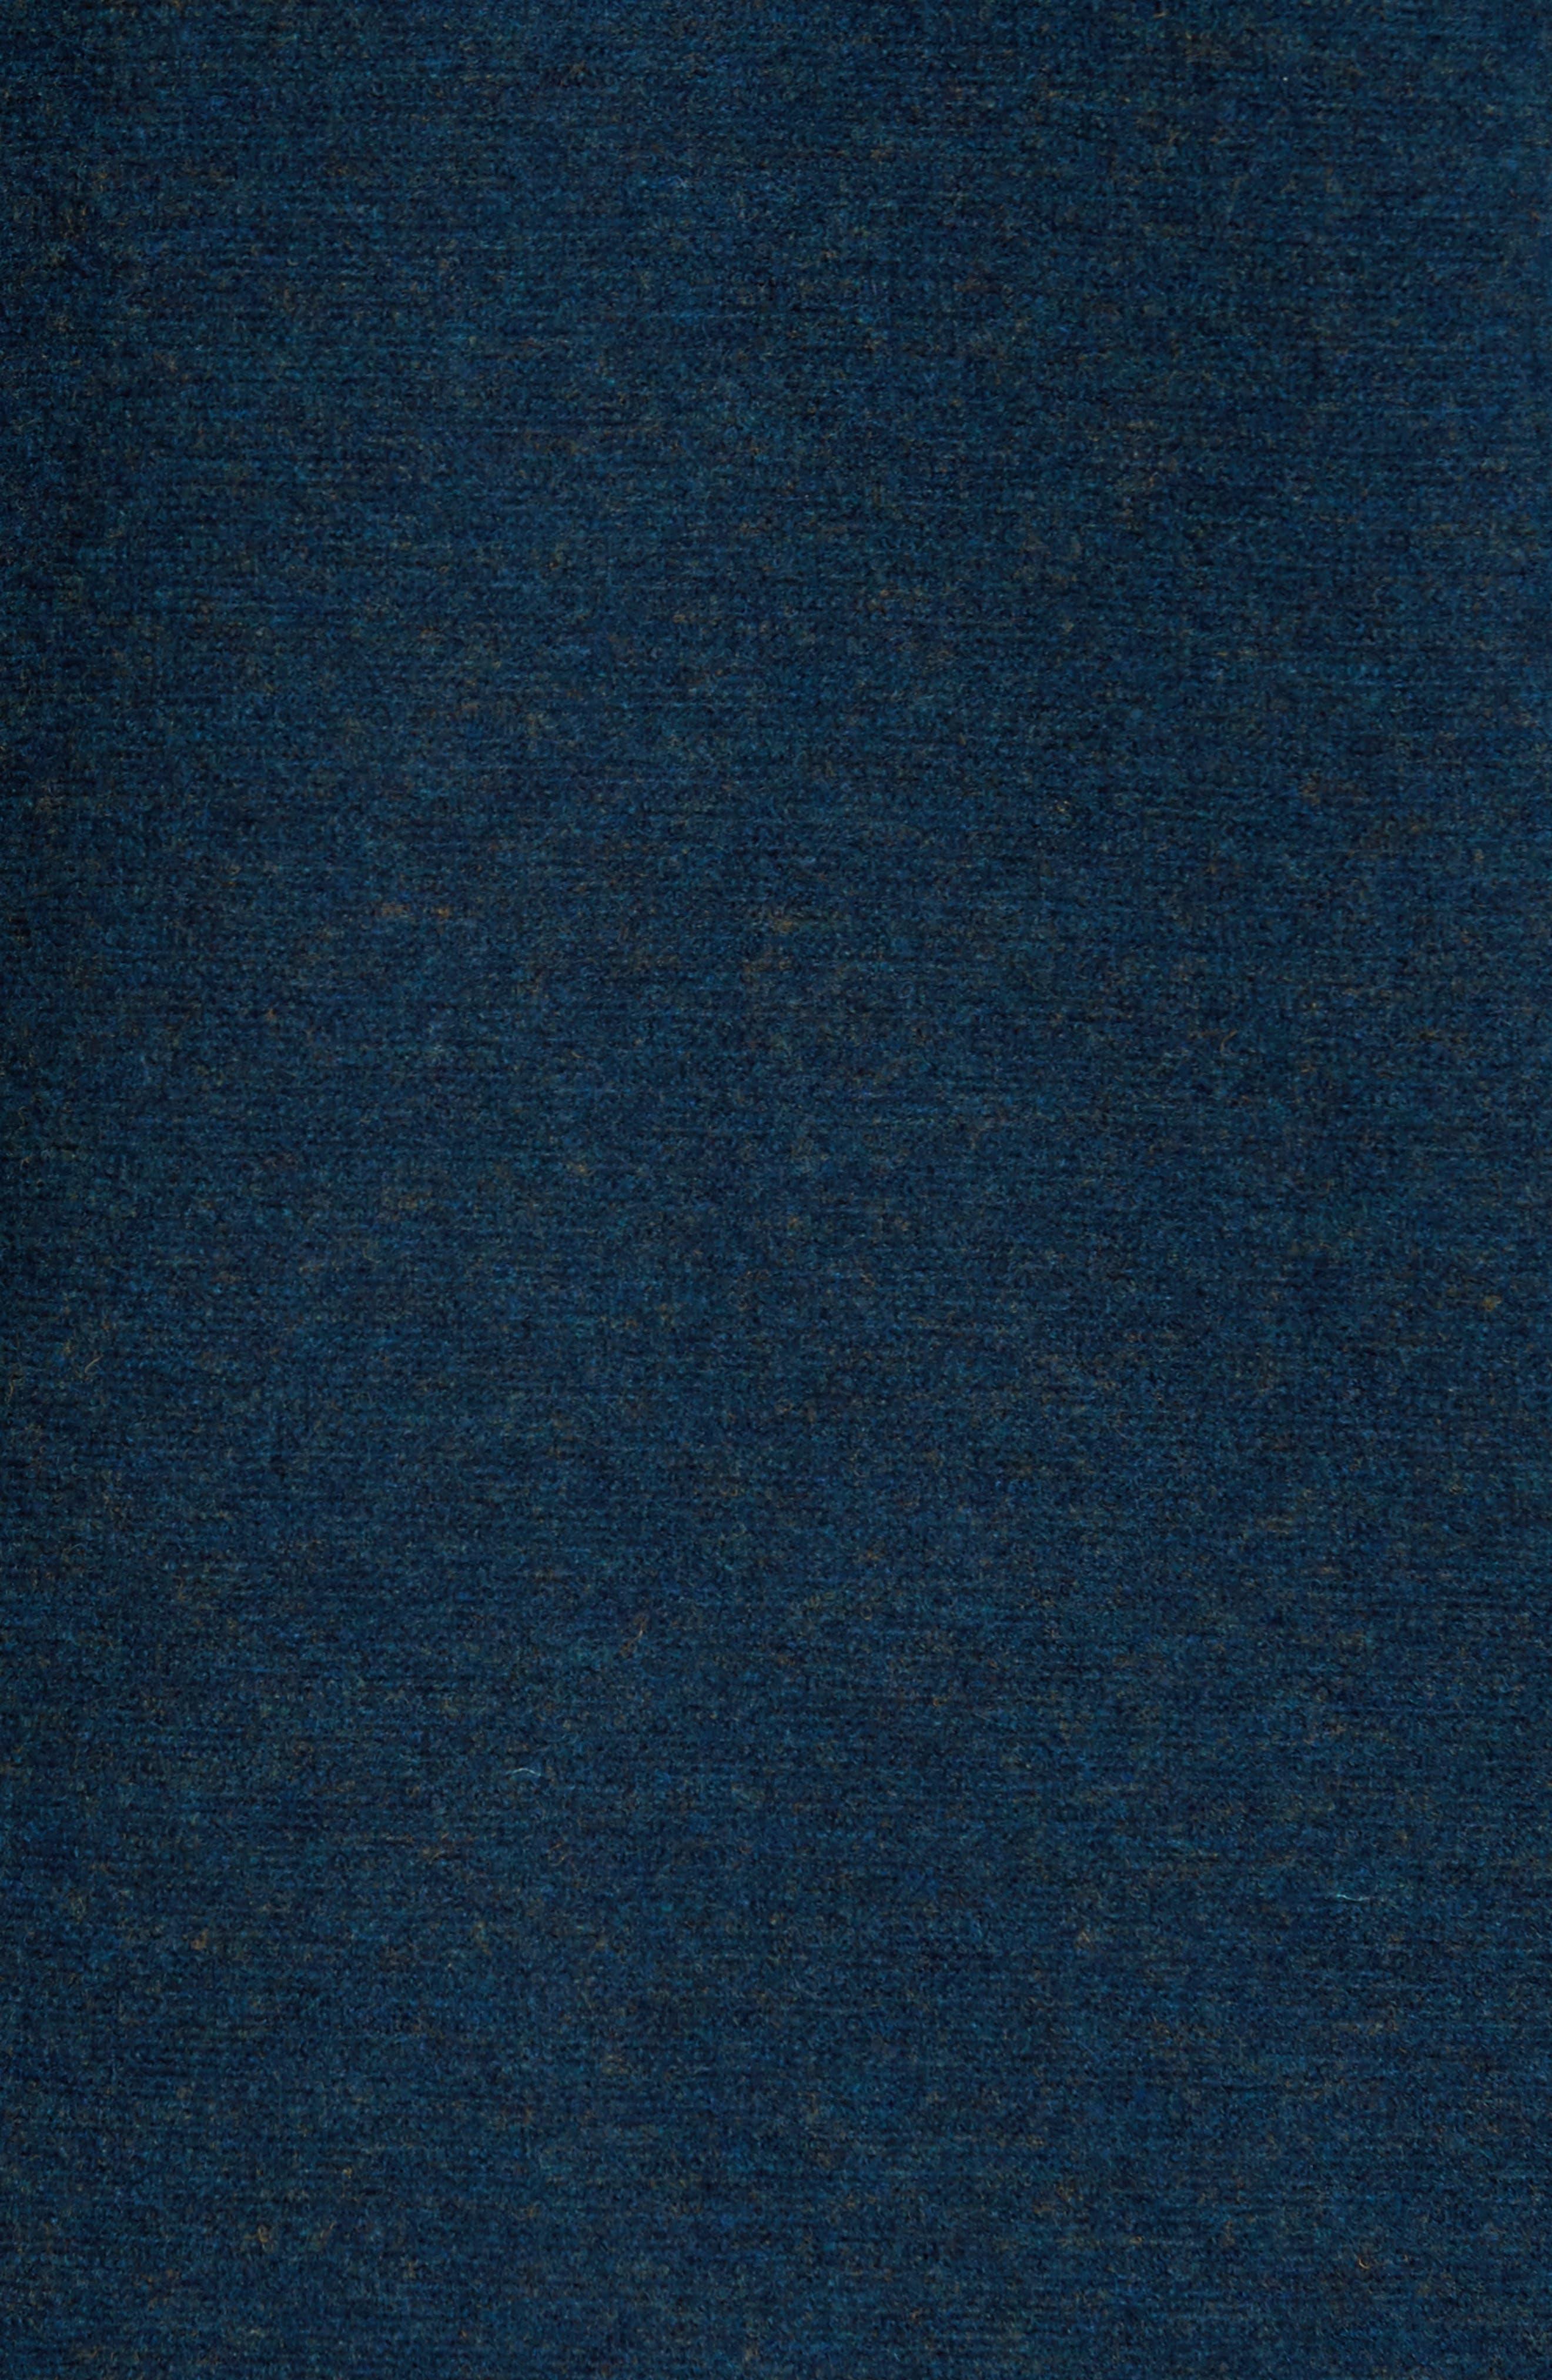 Scout Jura Merino Wool Blend Quarter Zip Pullover,                             Alternate thumbnail 24, color,